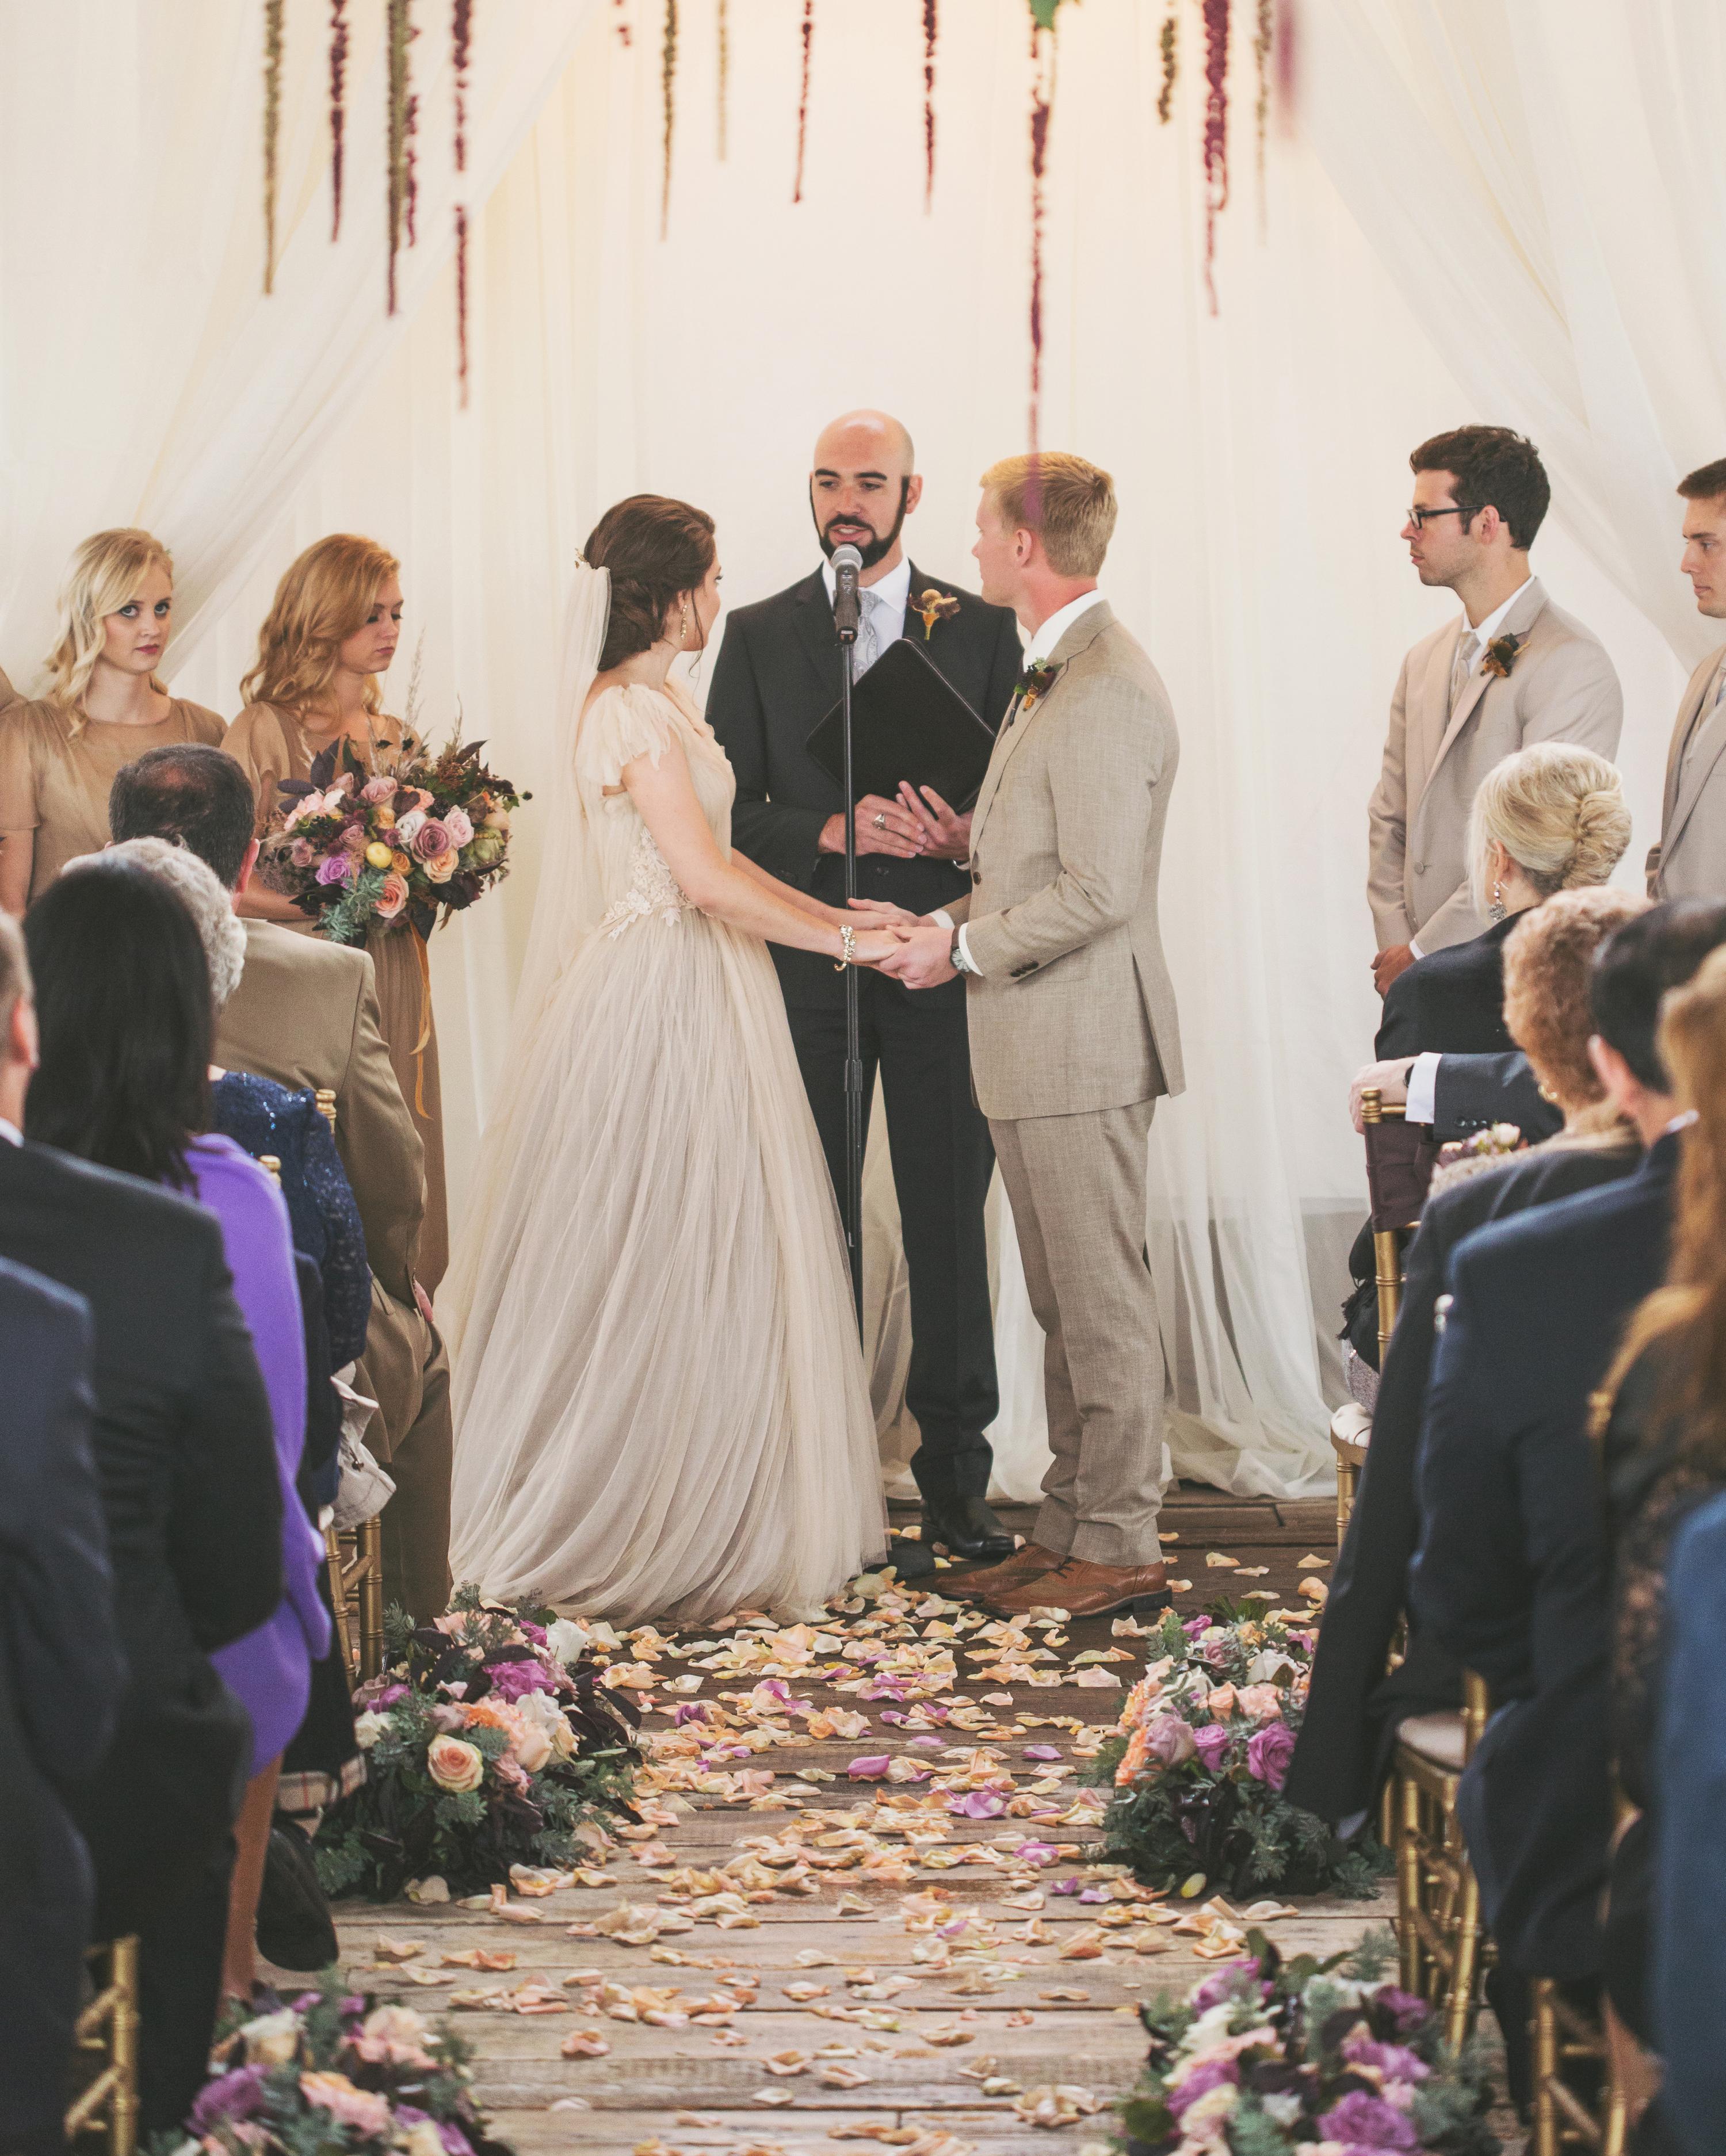 sara-matt-wedding-ceremony-2121-s111990-0715.jpg